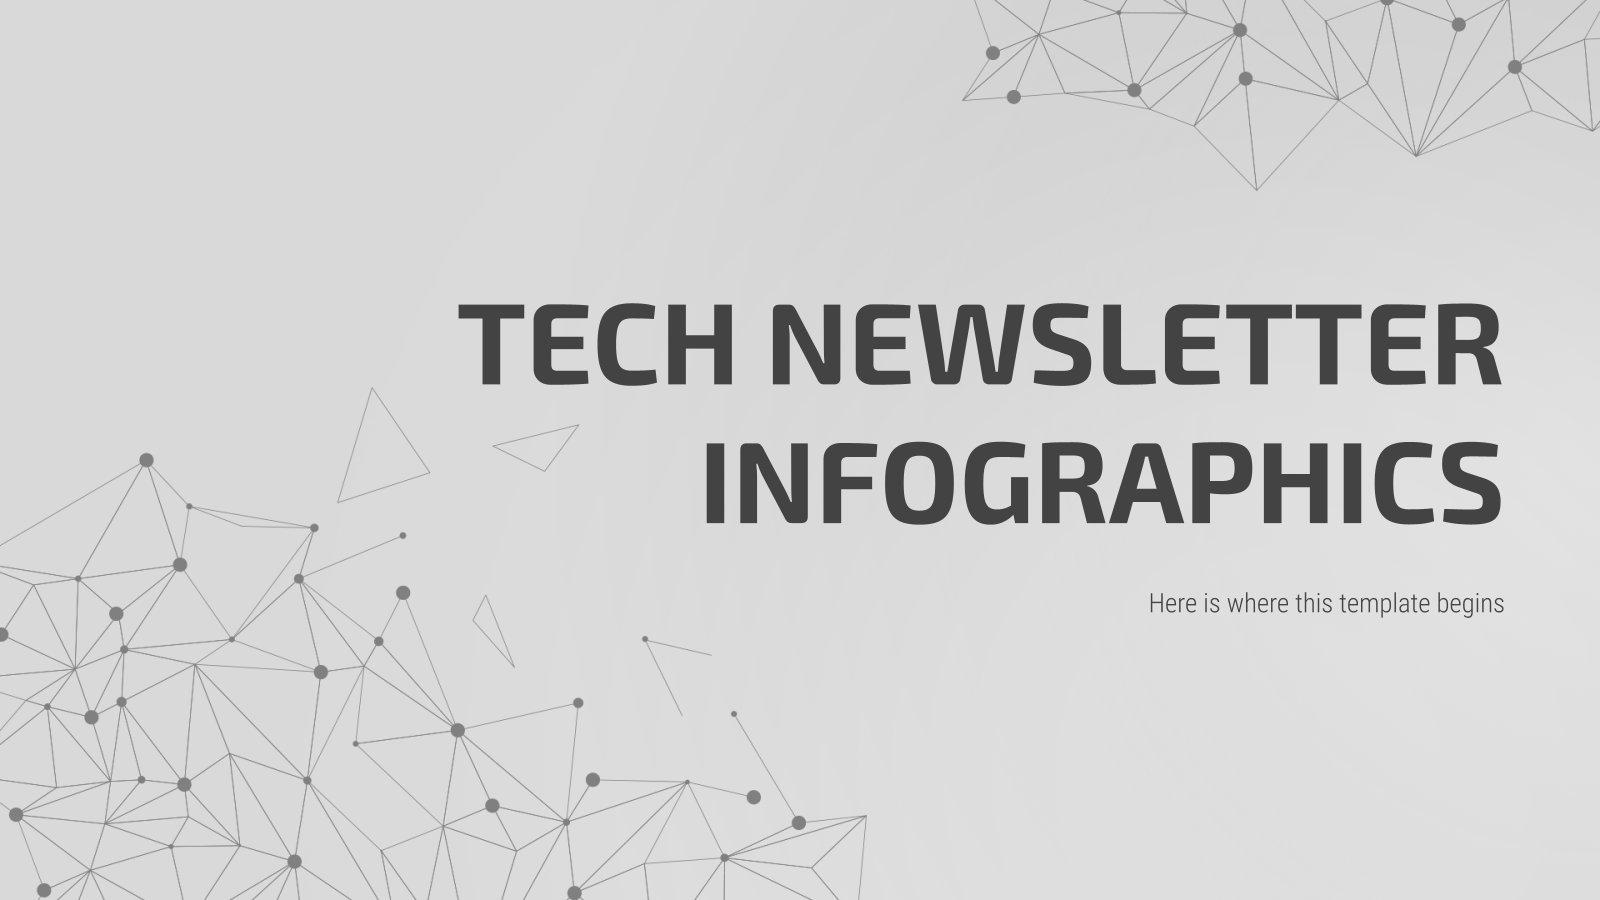 Plantilla de presentación Infografías newsletter de tecnología